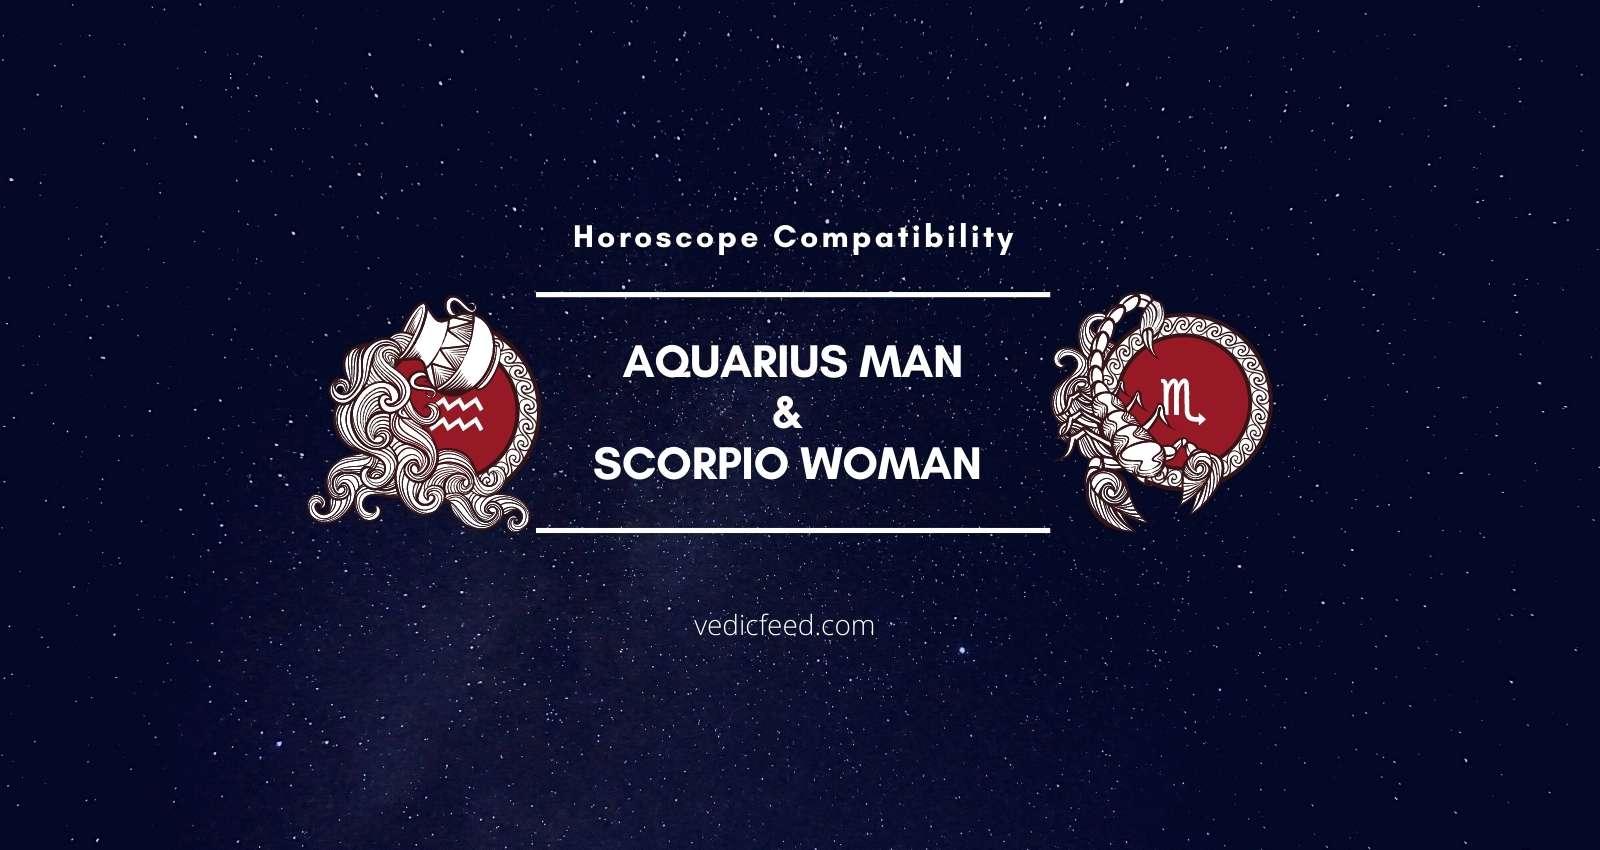 Aquarius Man and Scorpio Woman Compatibility